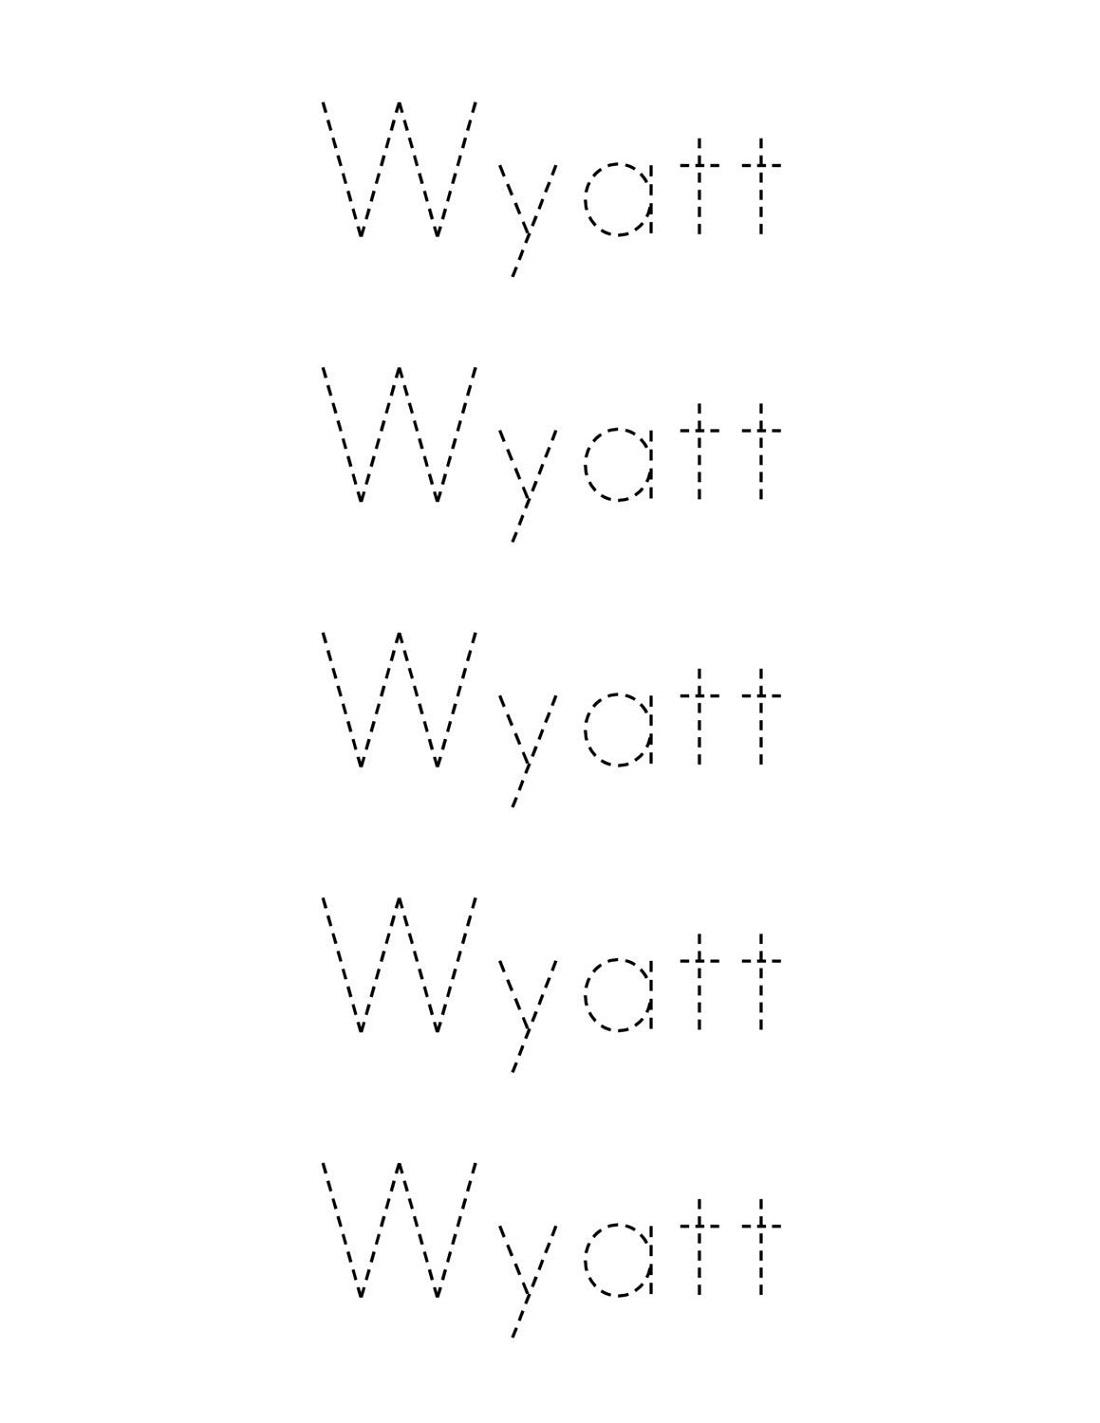 Easy Traceable Names Worksheets